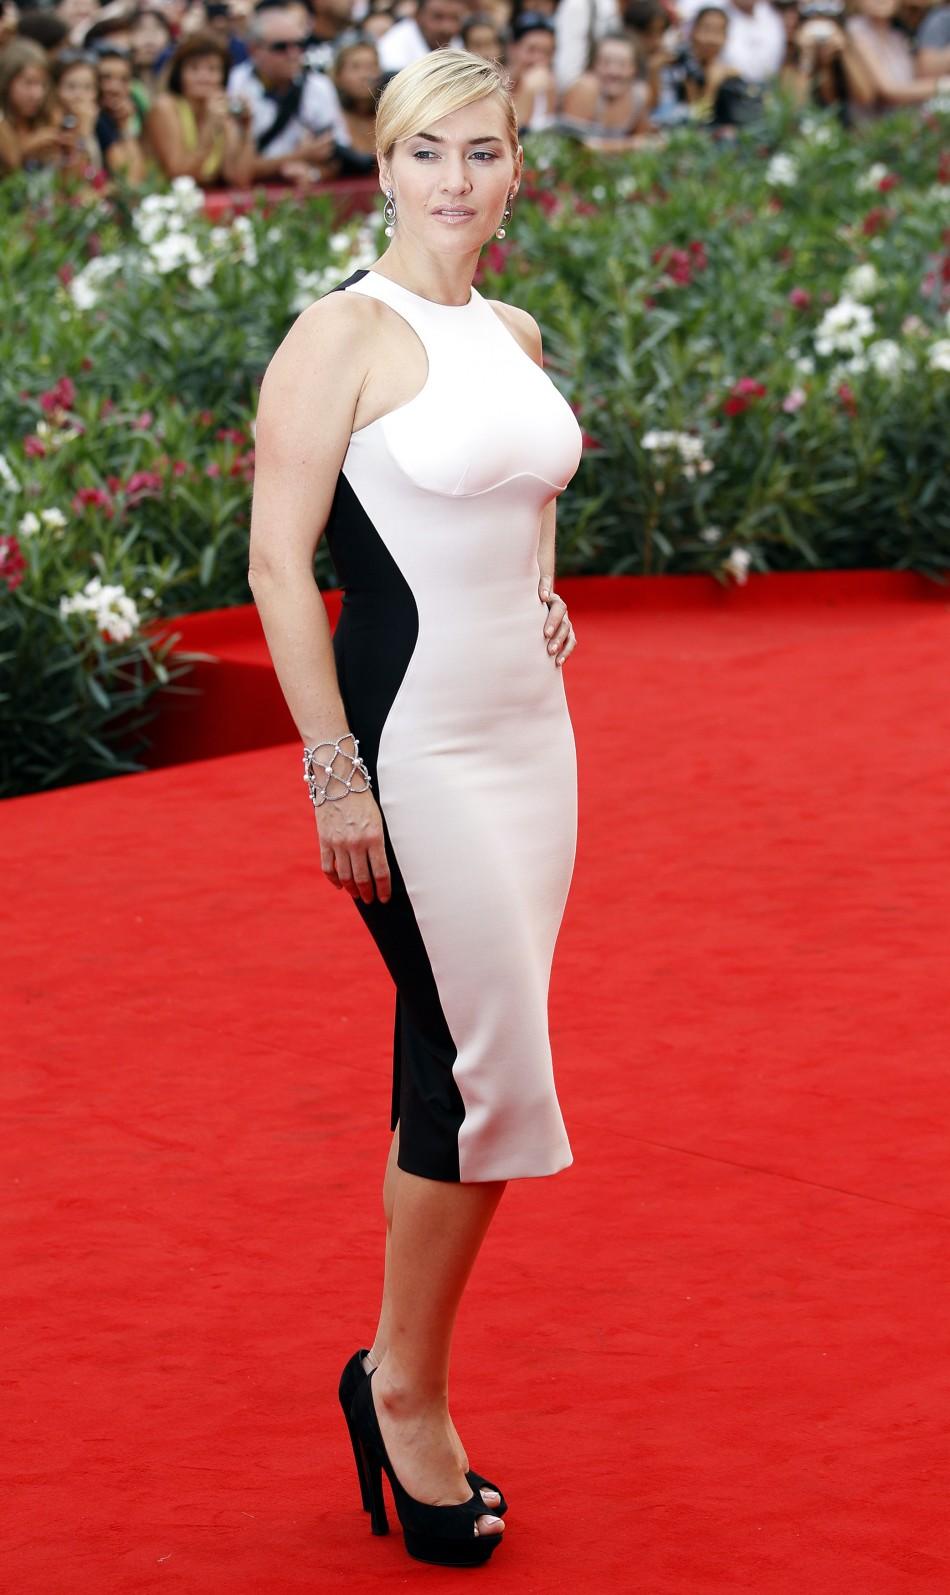 Top 10 Most Beautiful Women At Venice Film Festival